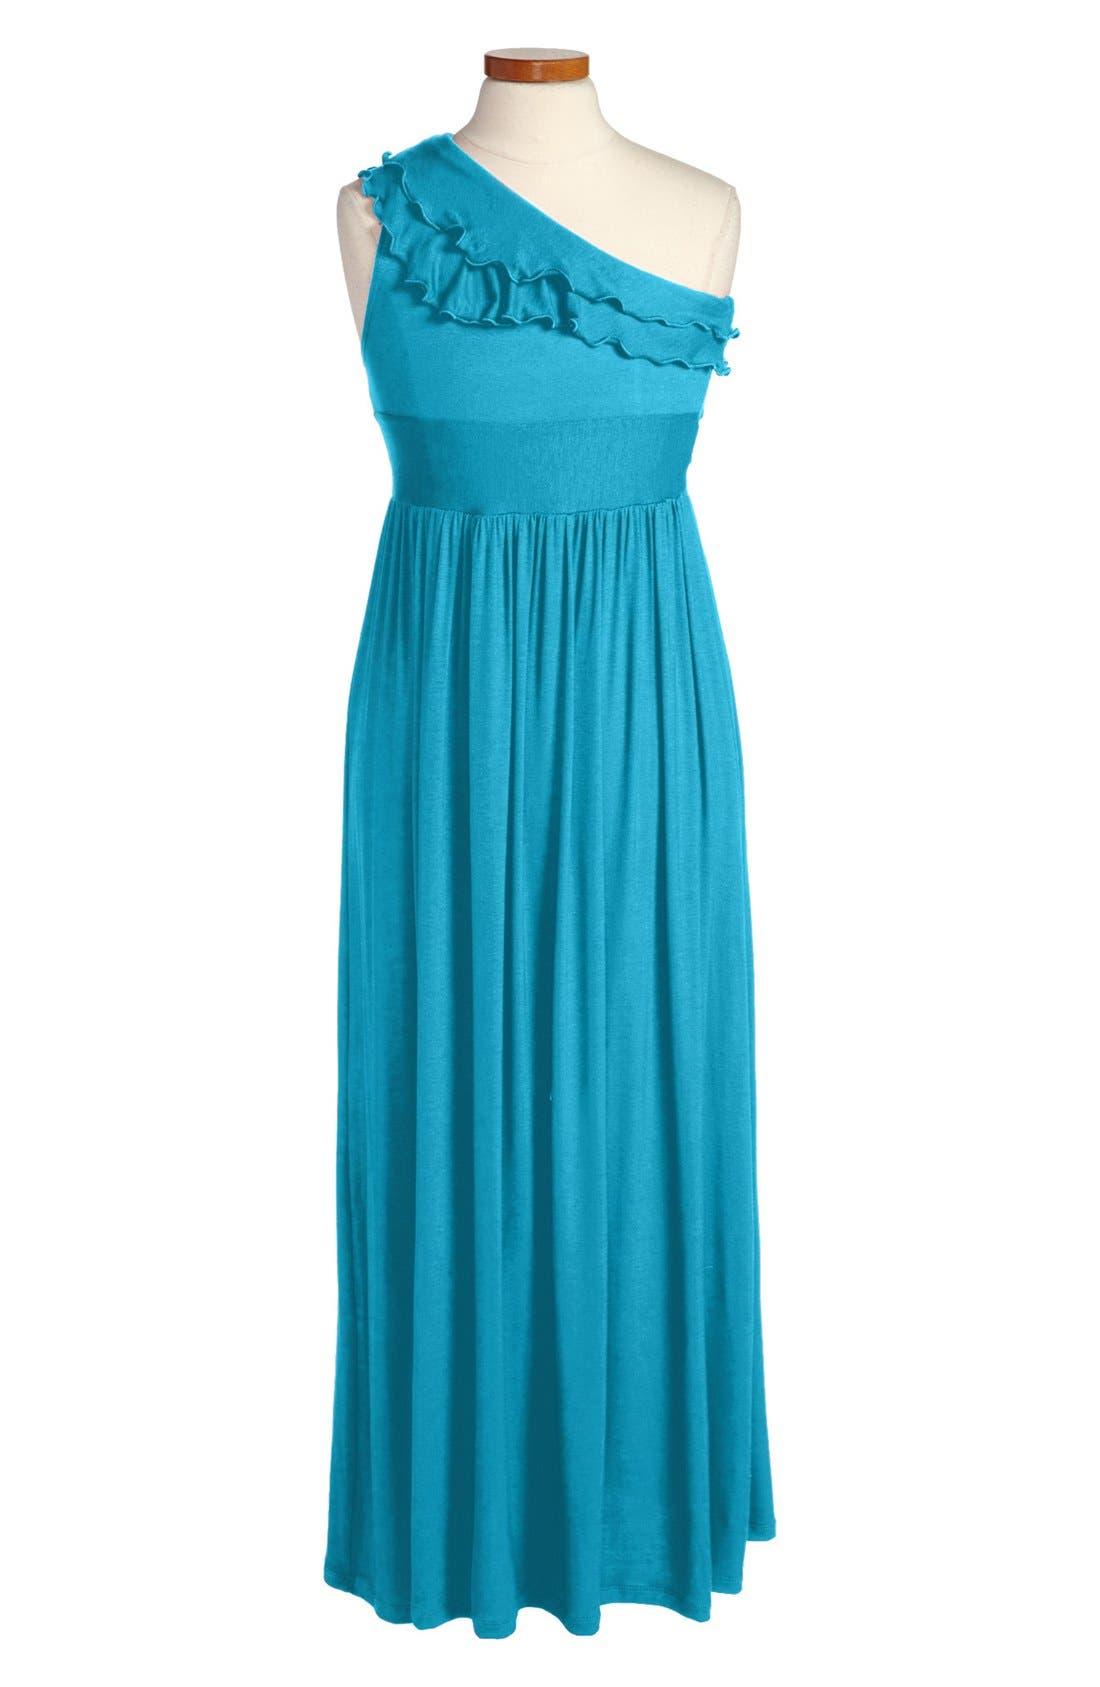 Alternate Image 1 Selected - Fiveloaves Twofish One-Shoulder Maxi Dress (Big Girls)